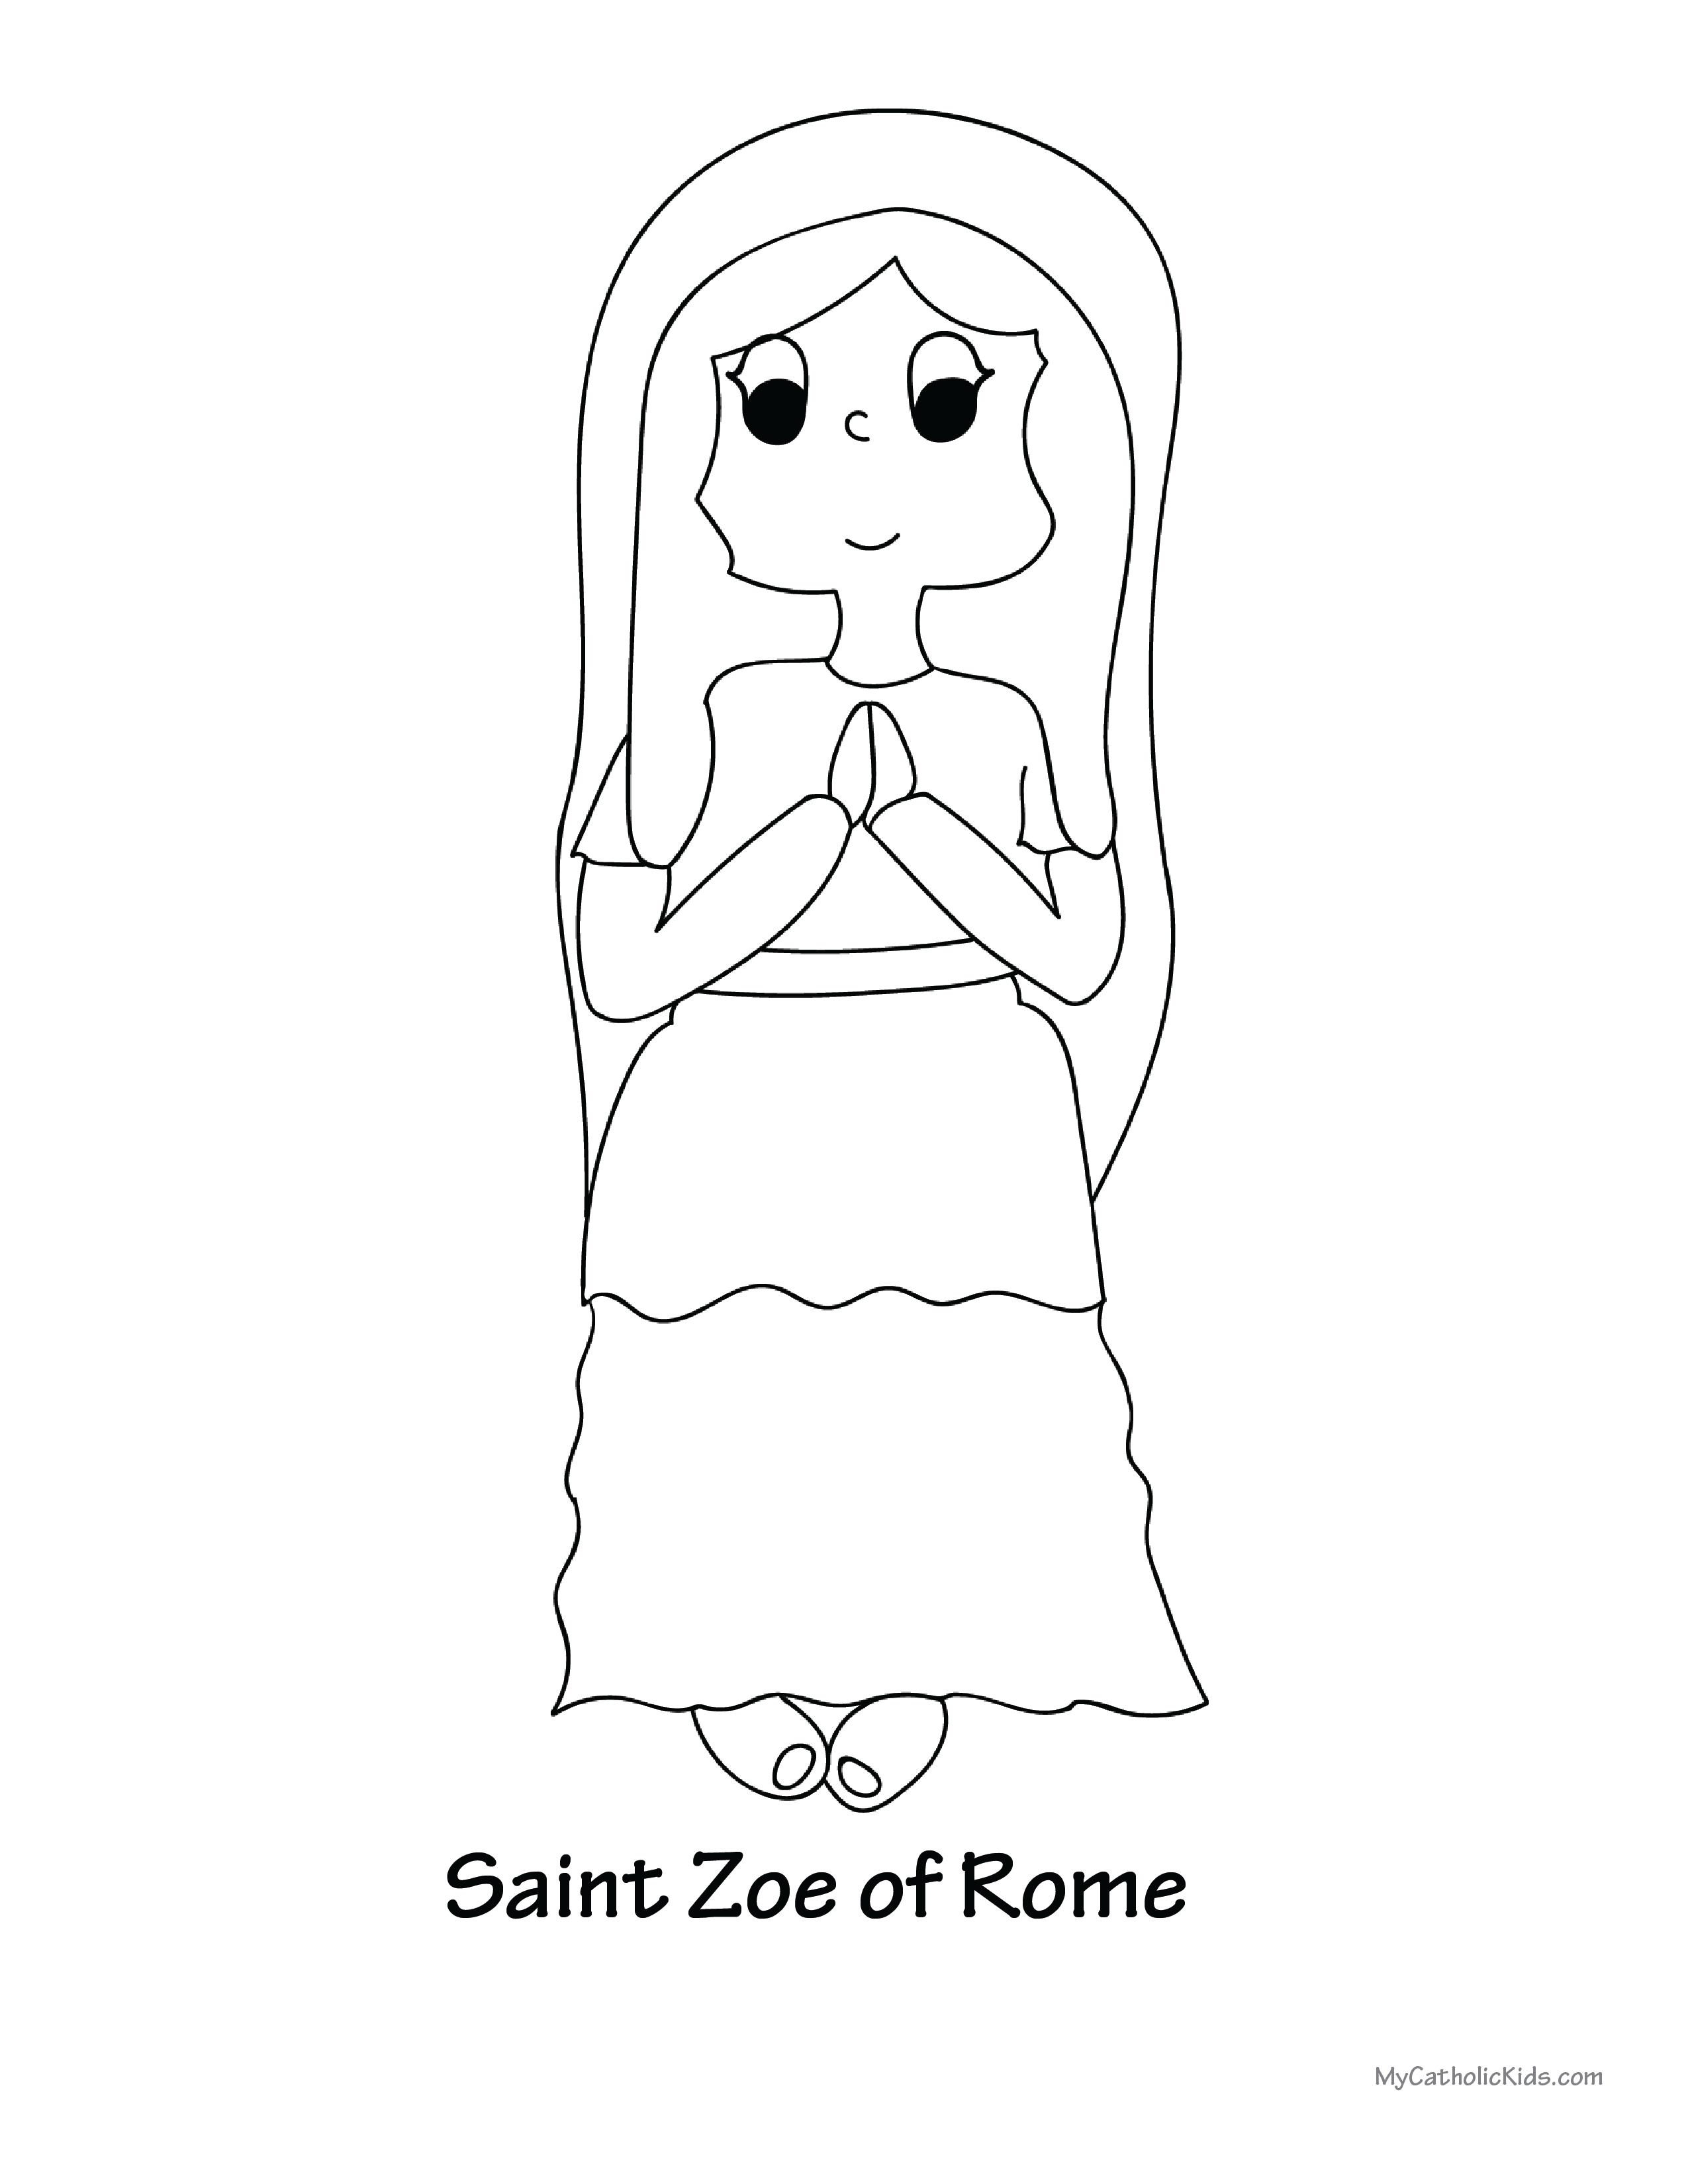 Zoe saint